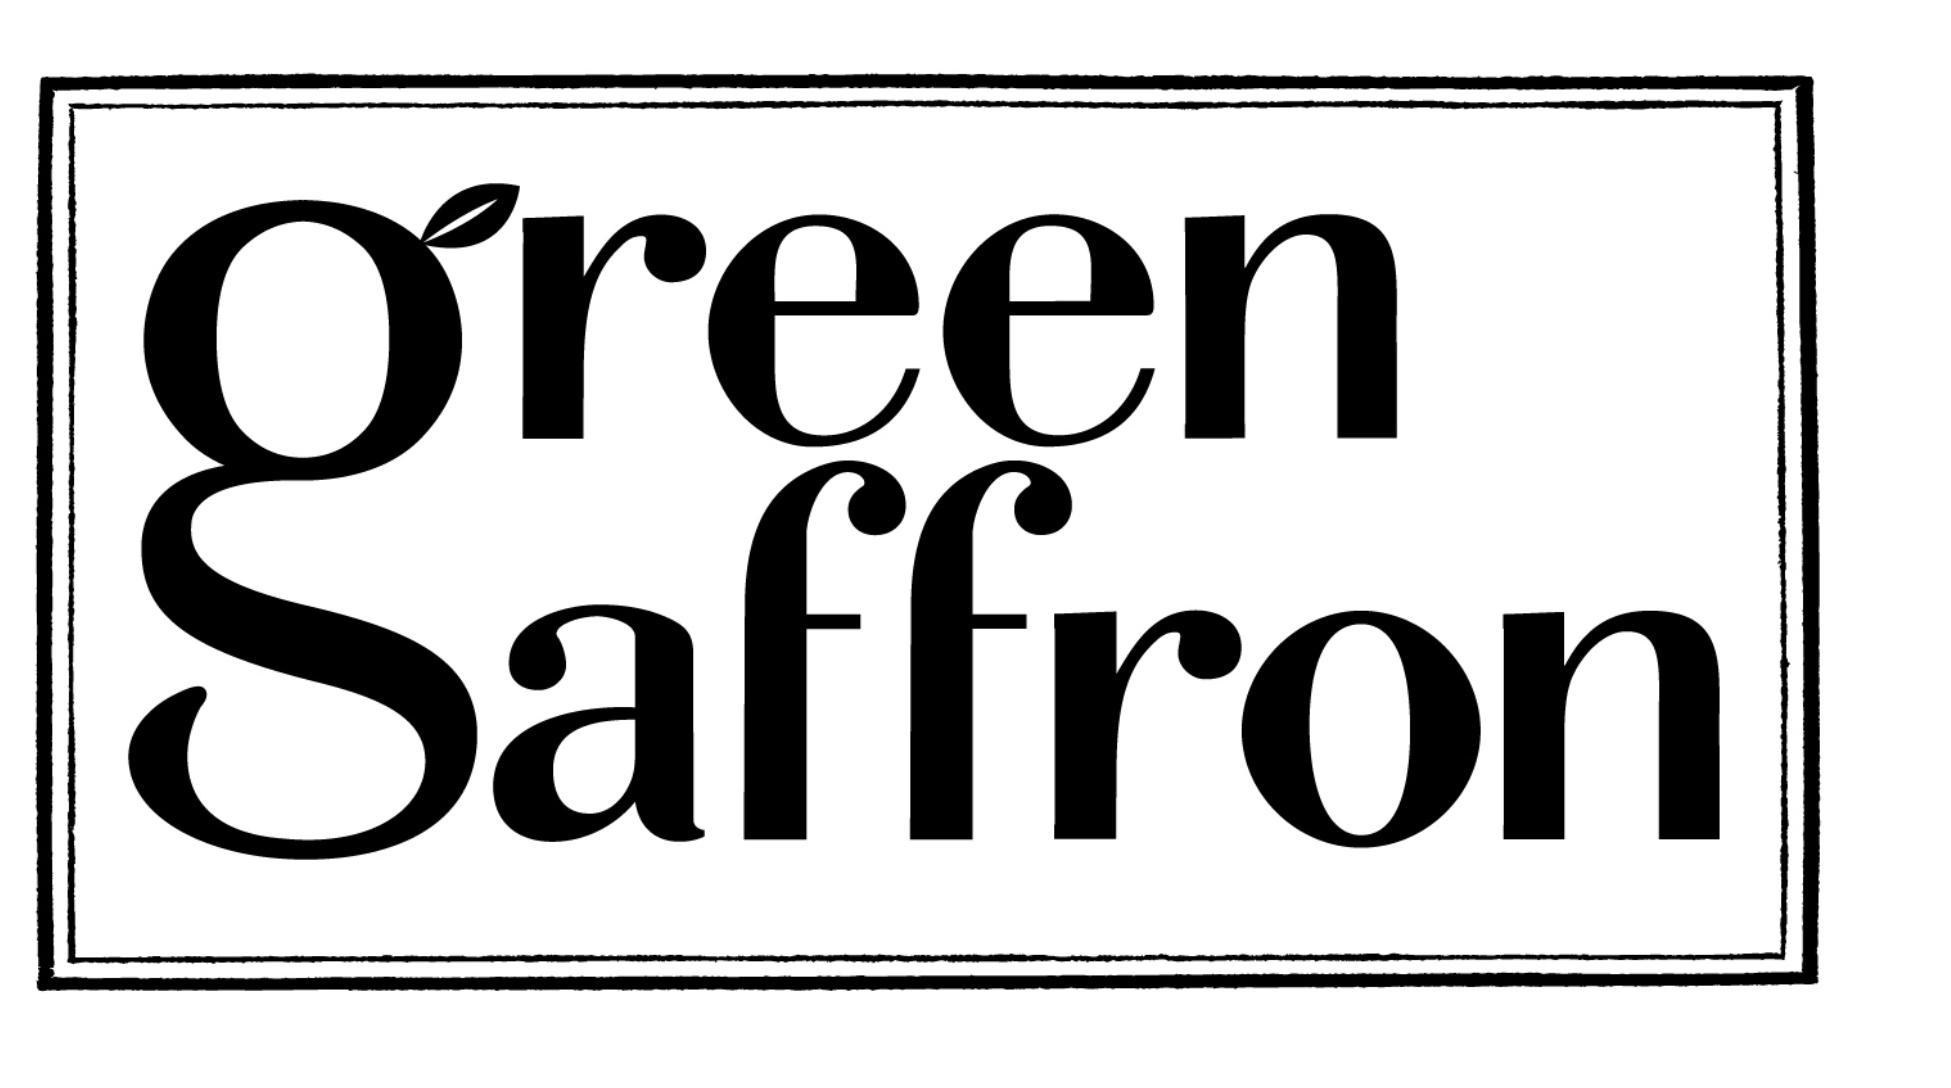 Image of Green Saffron Spices Ltd logotype